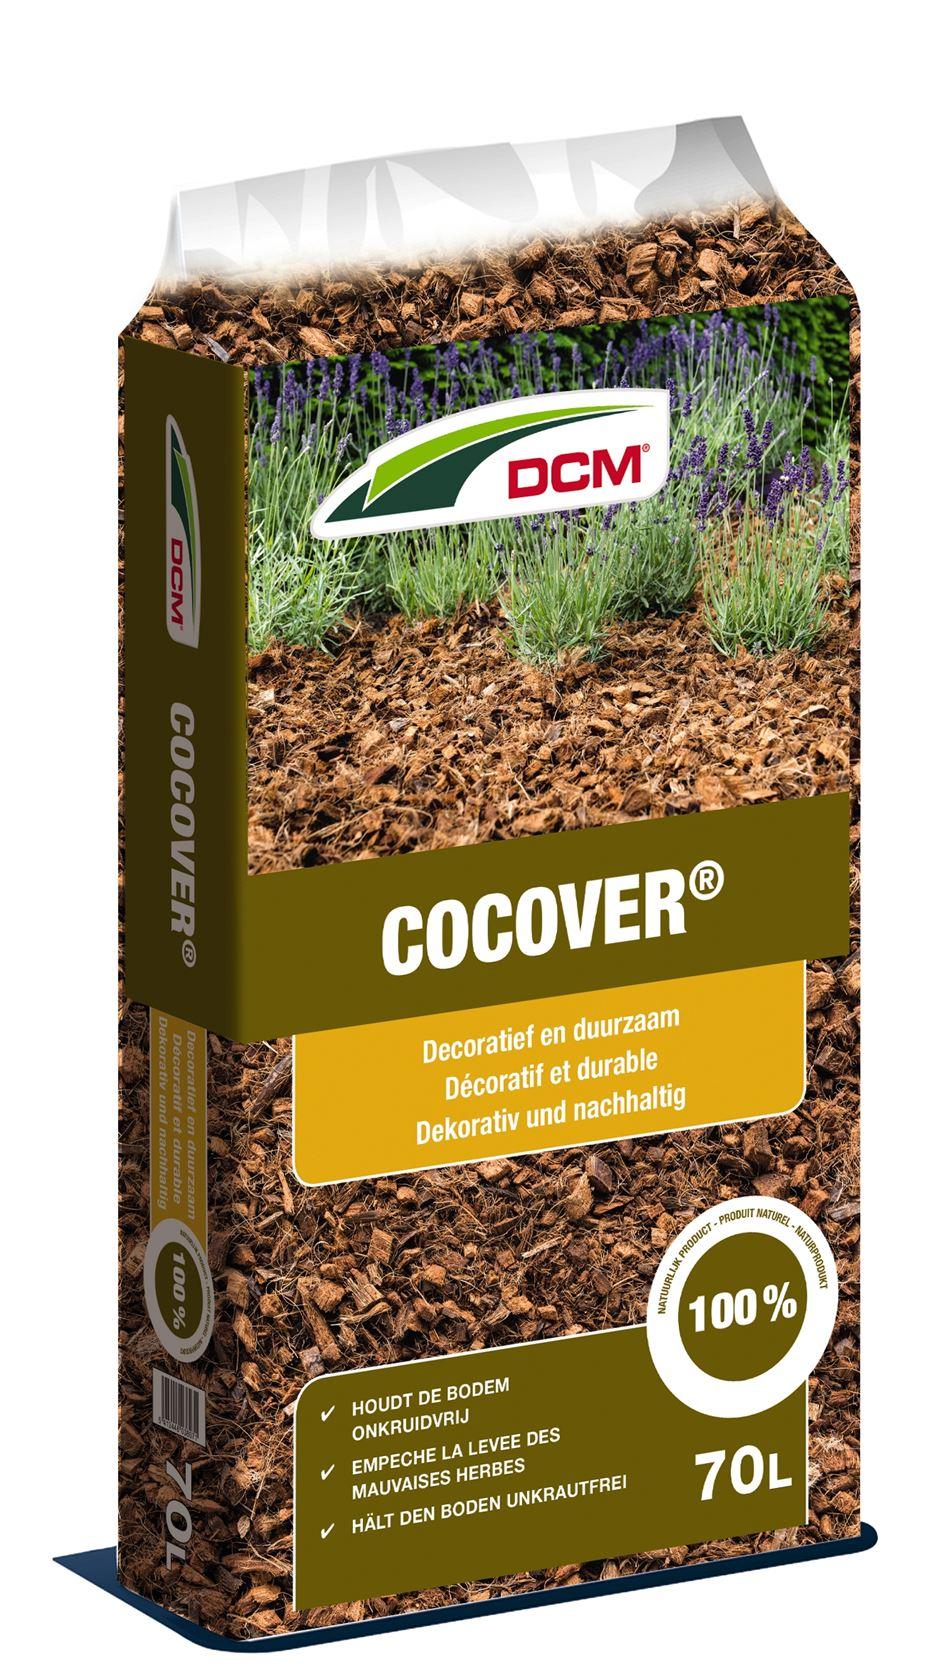 DCM-cocover-Kokosschors-70L